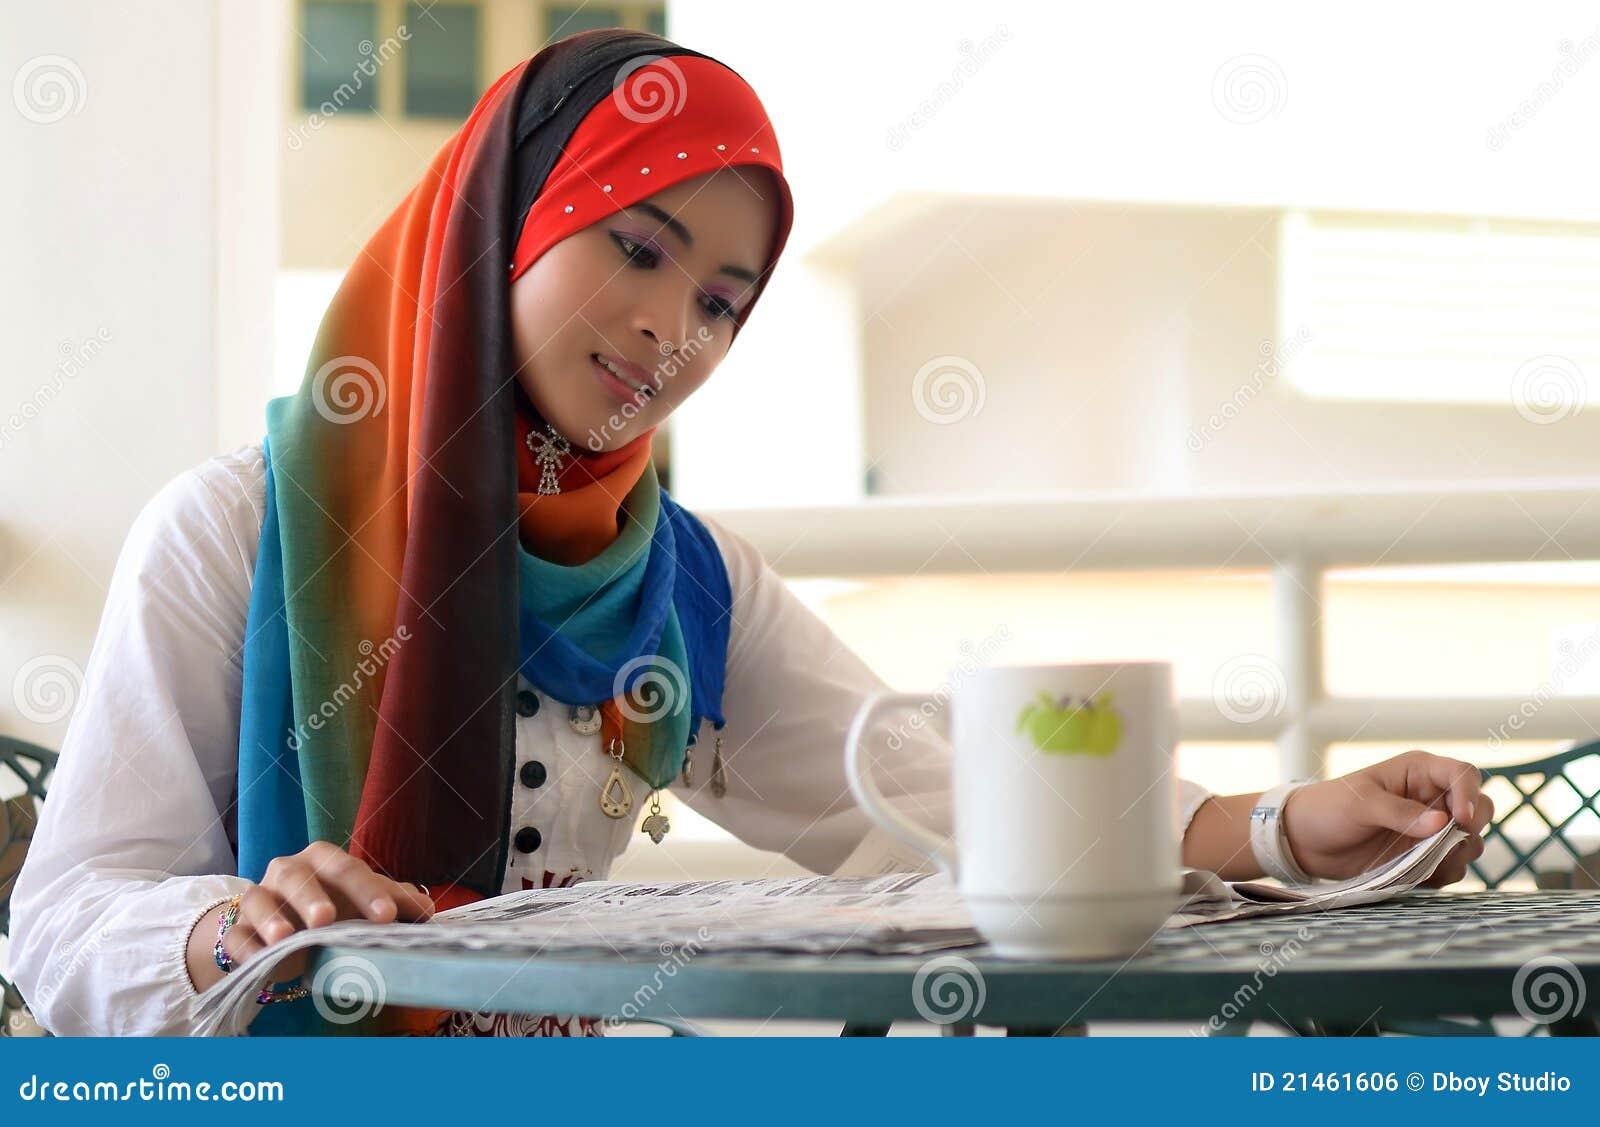 Hübscher weiblicher Moslem liest Zeitung